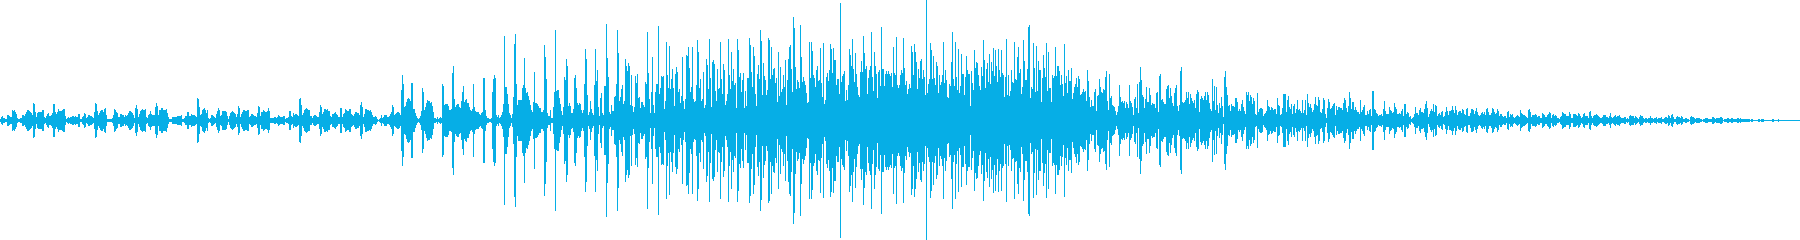 AMGアナログFX 15の再生済みの波形